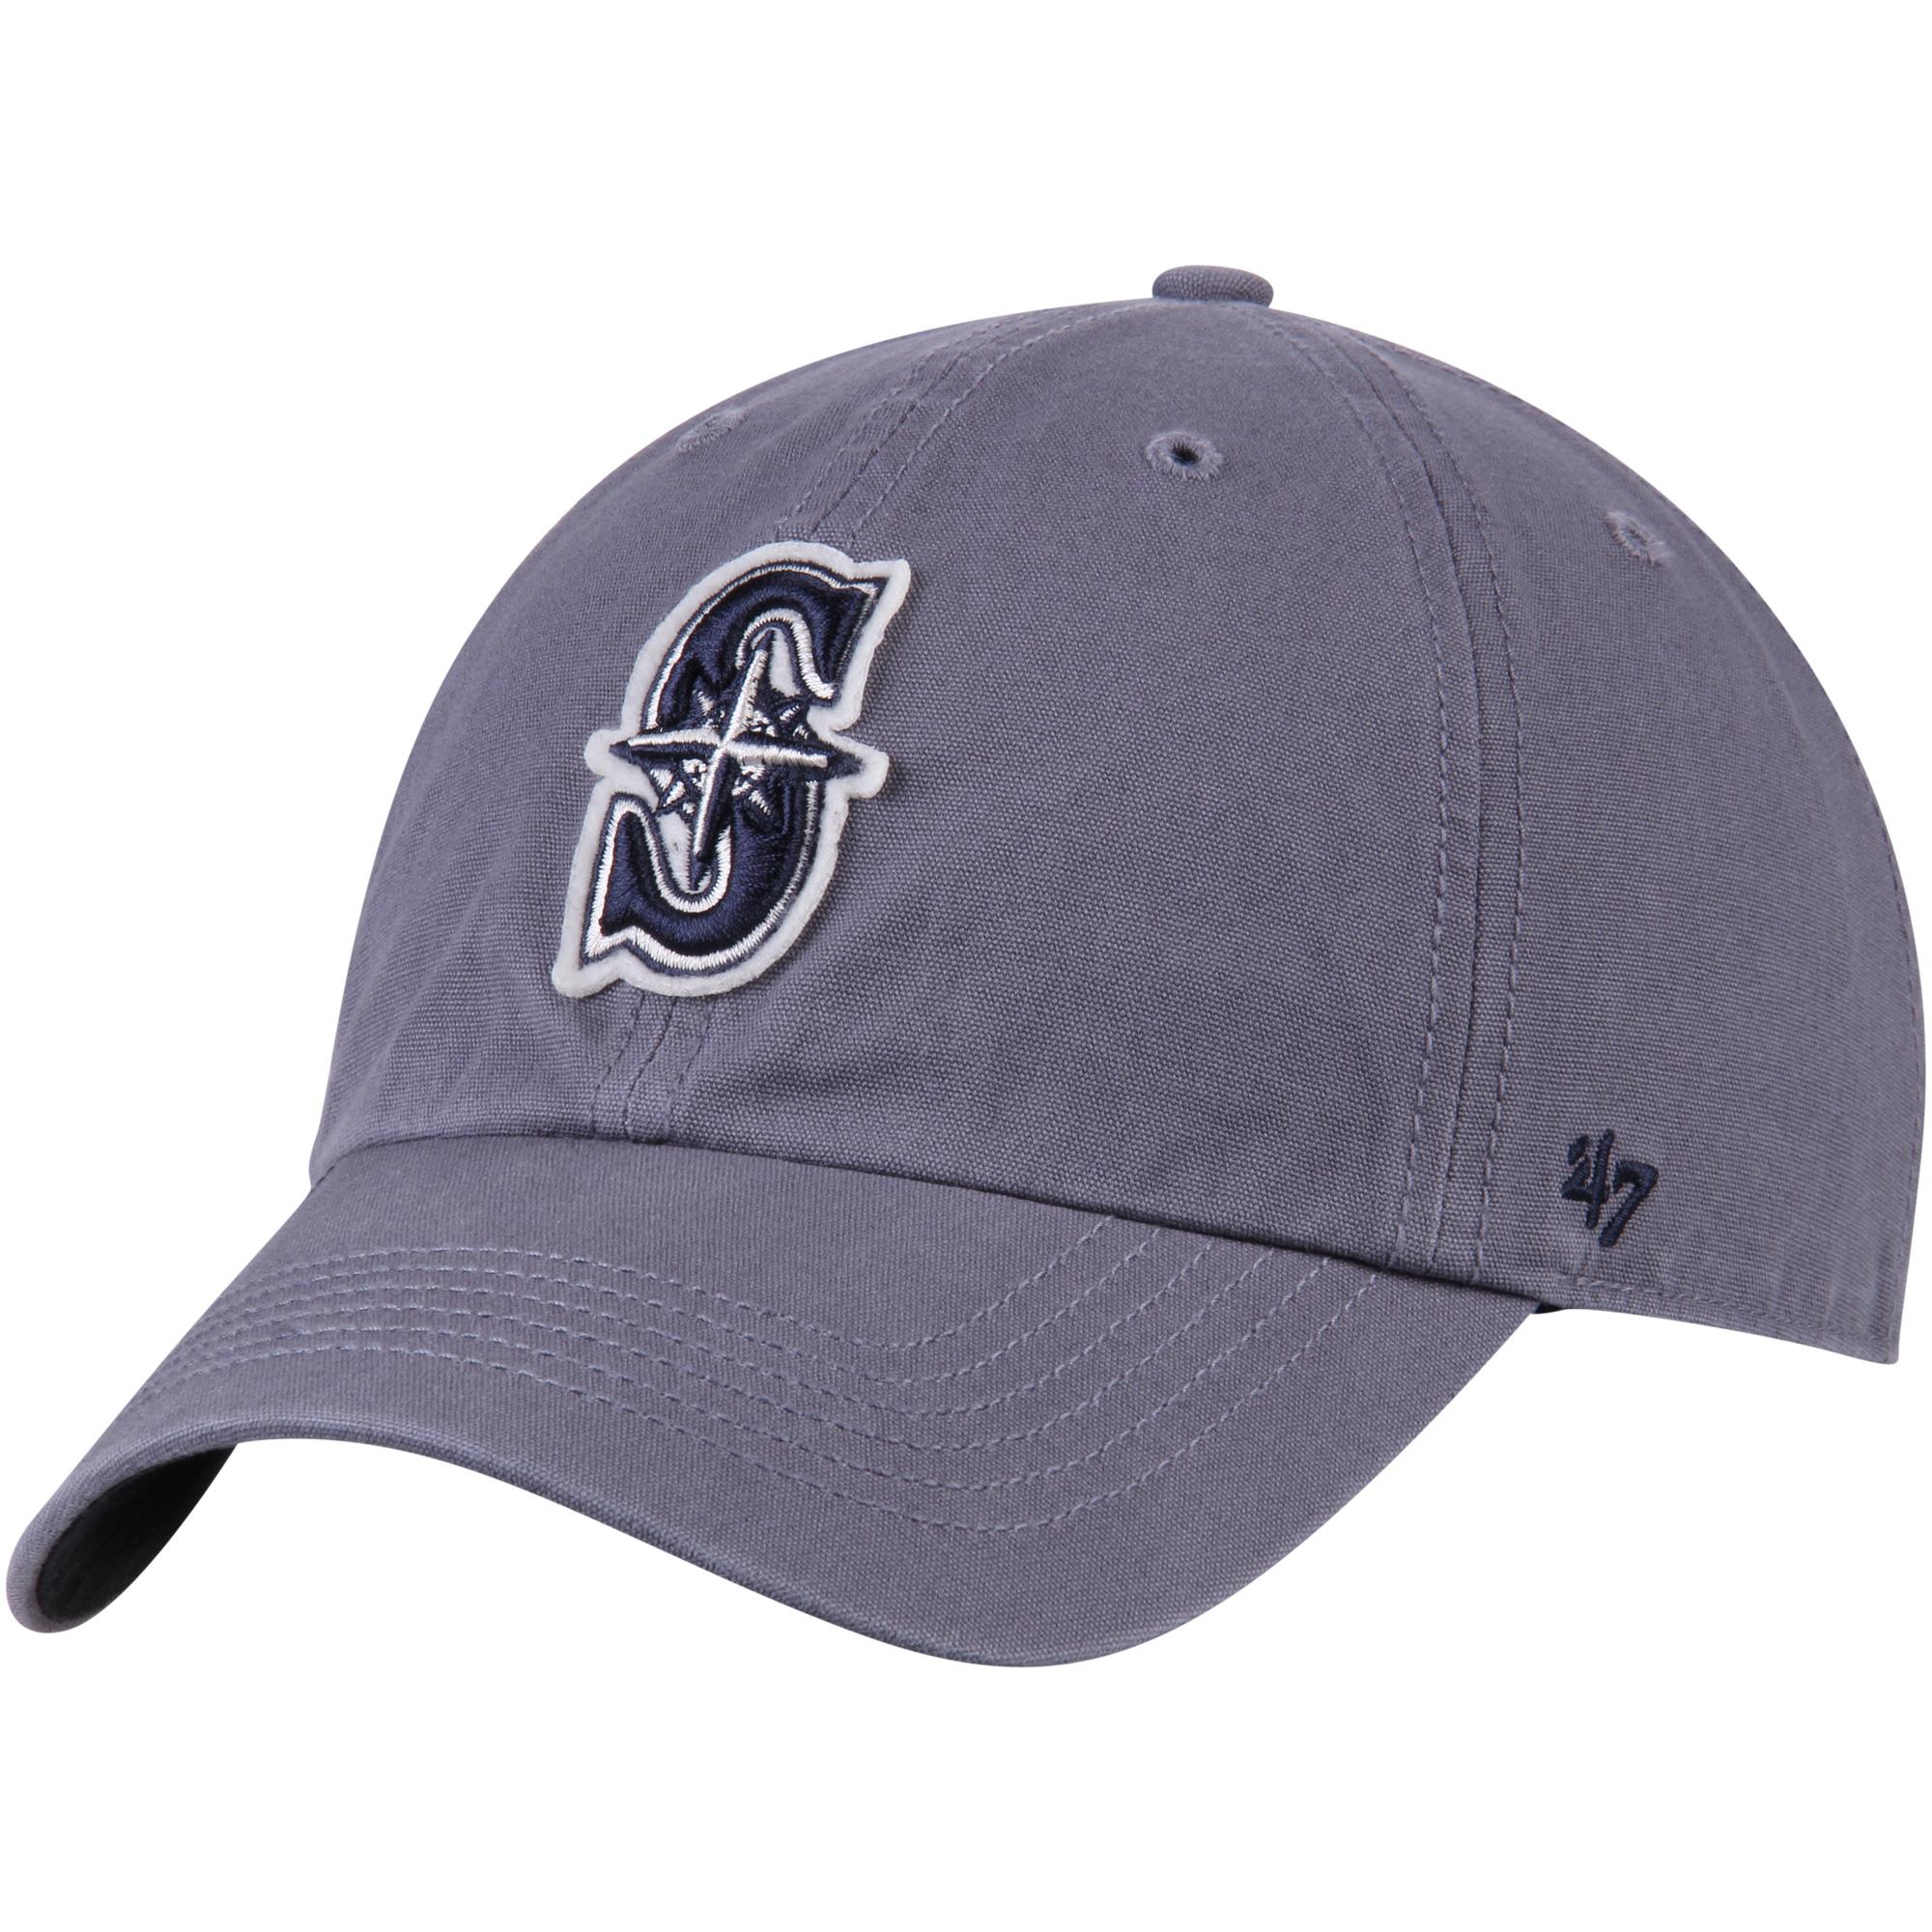 Seattle Mariners '47 Borderland Clean Up Adjustable Hat - Navy - OSFA